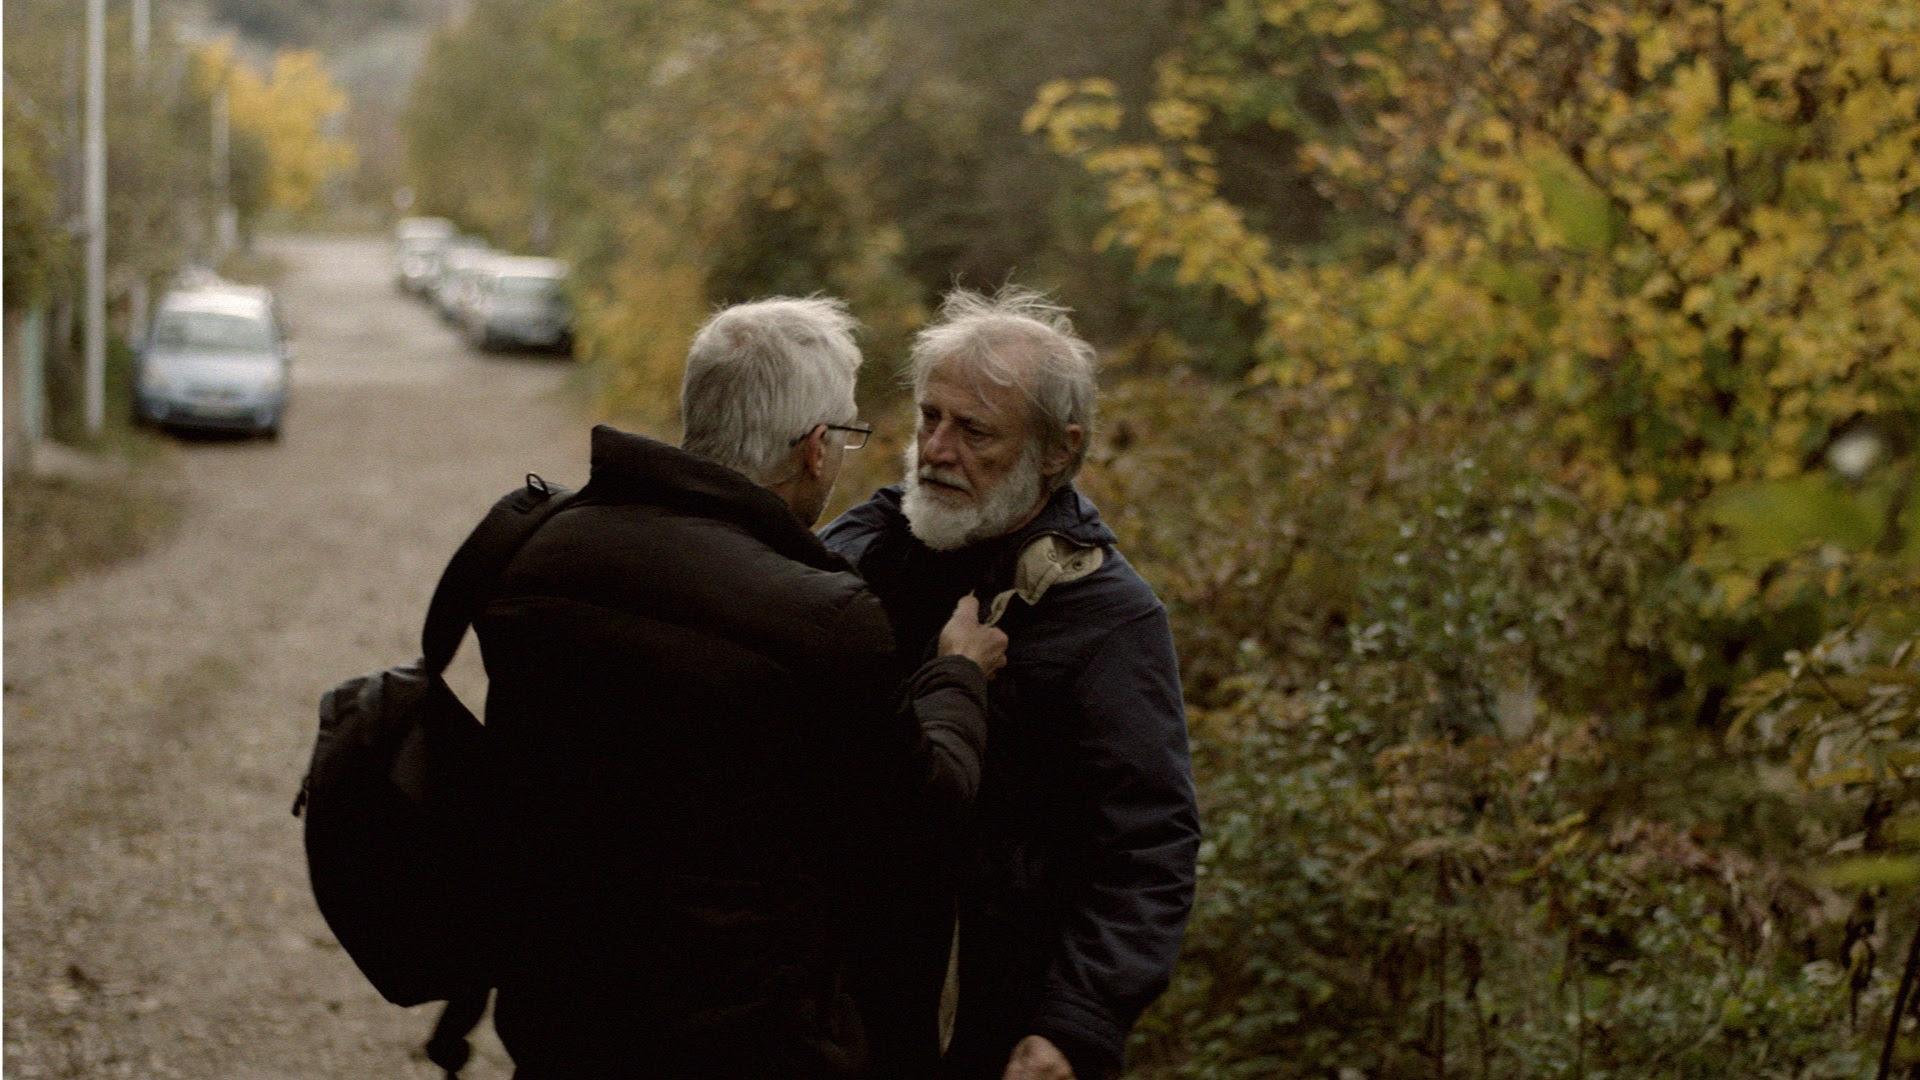 The Father, dirigida por Kristina Grozeva y Petar Valchanov